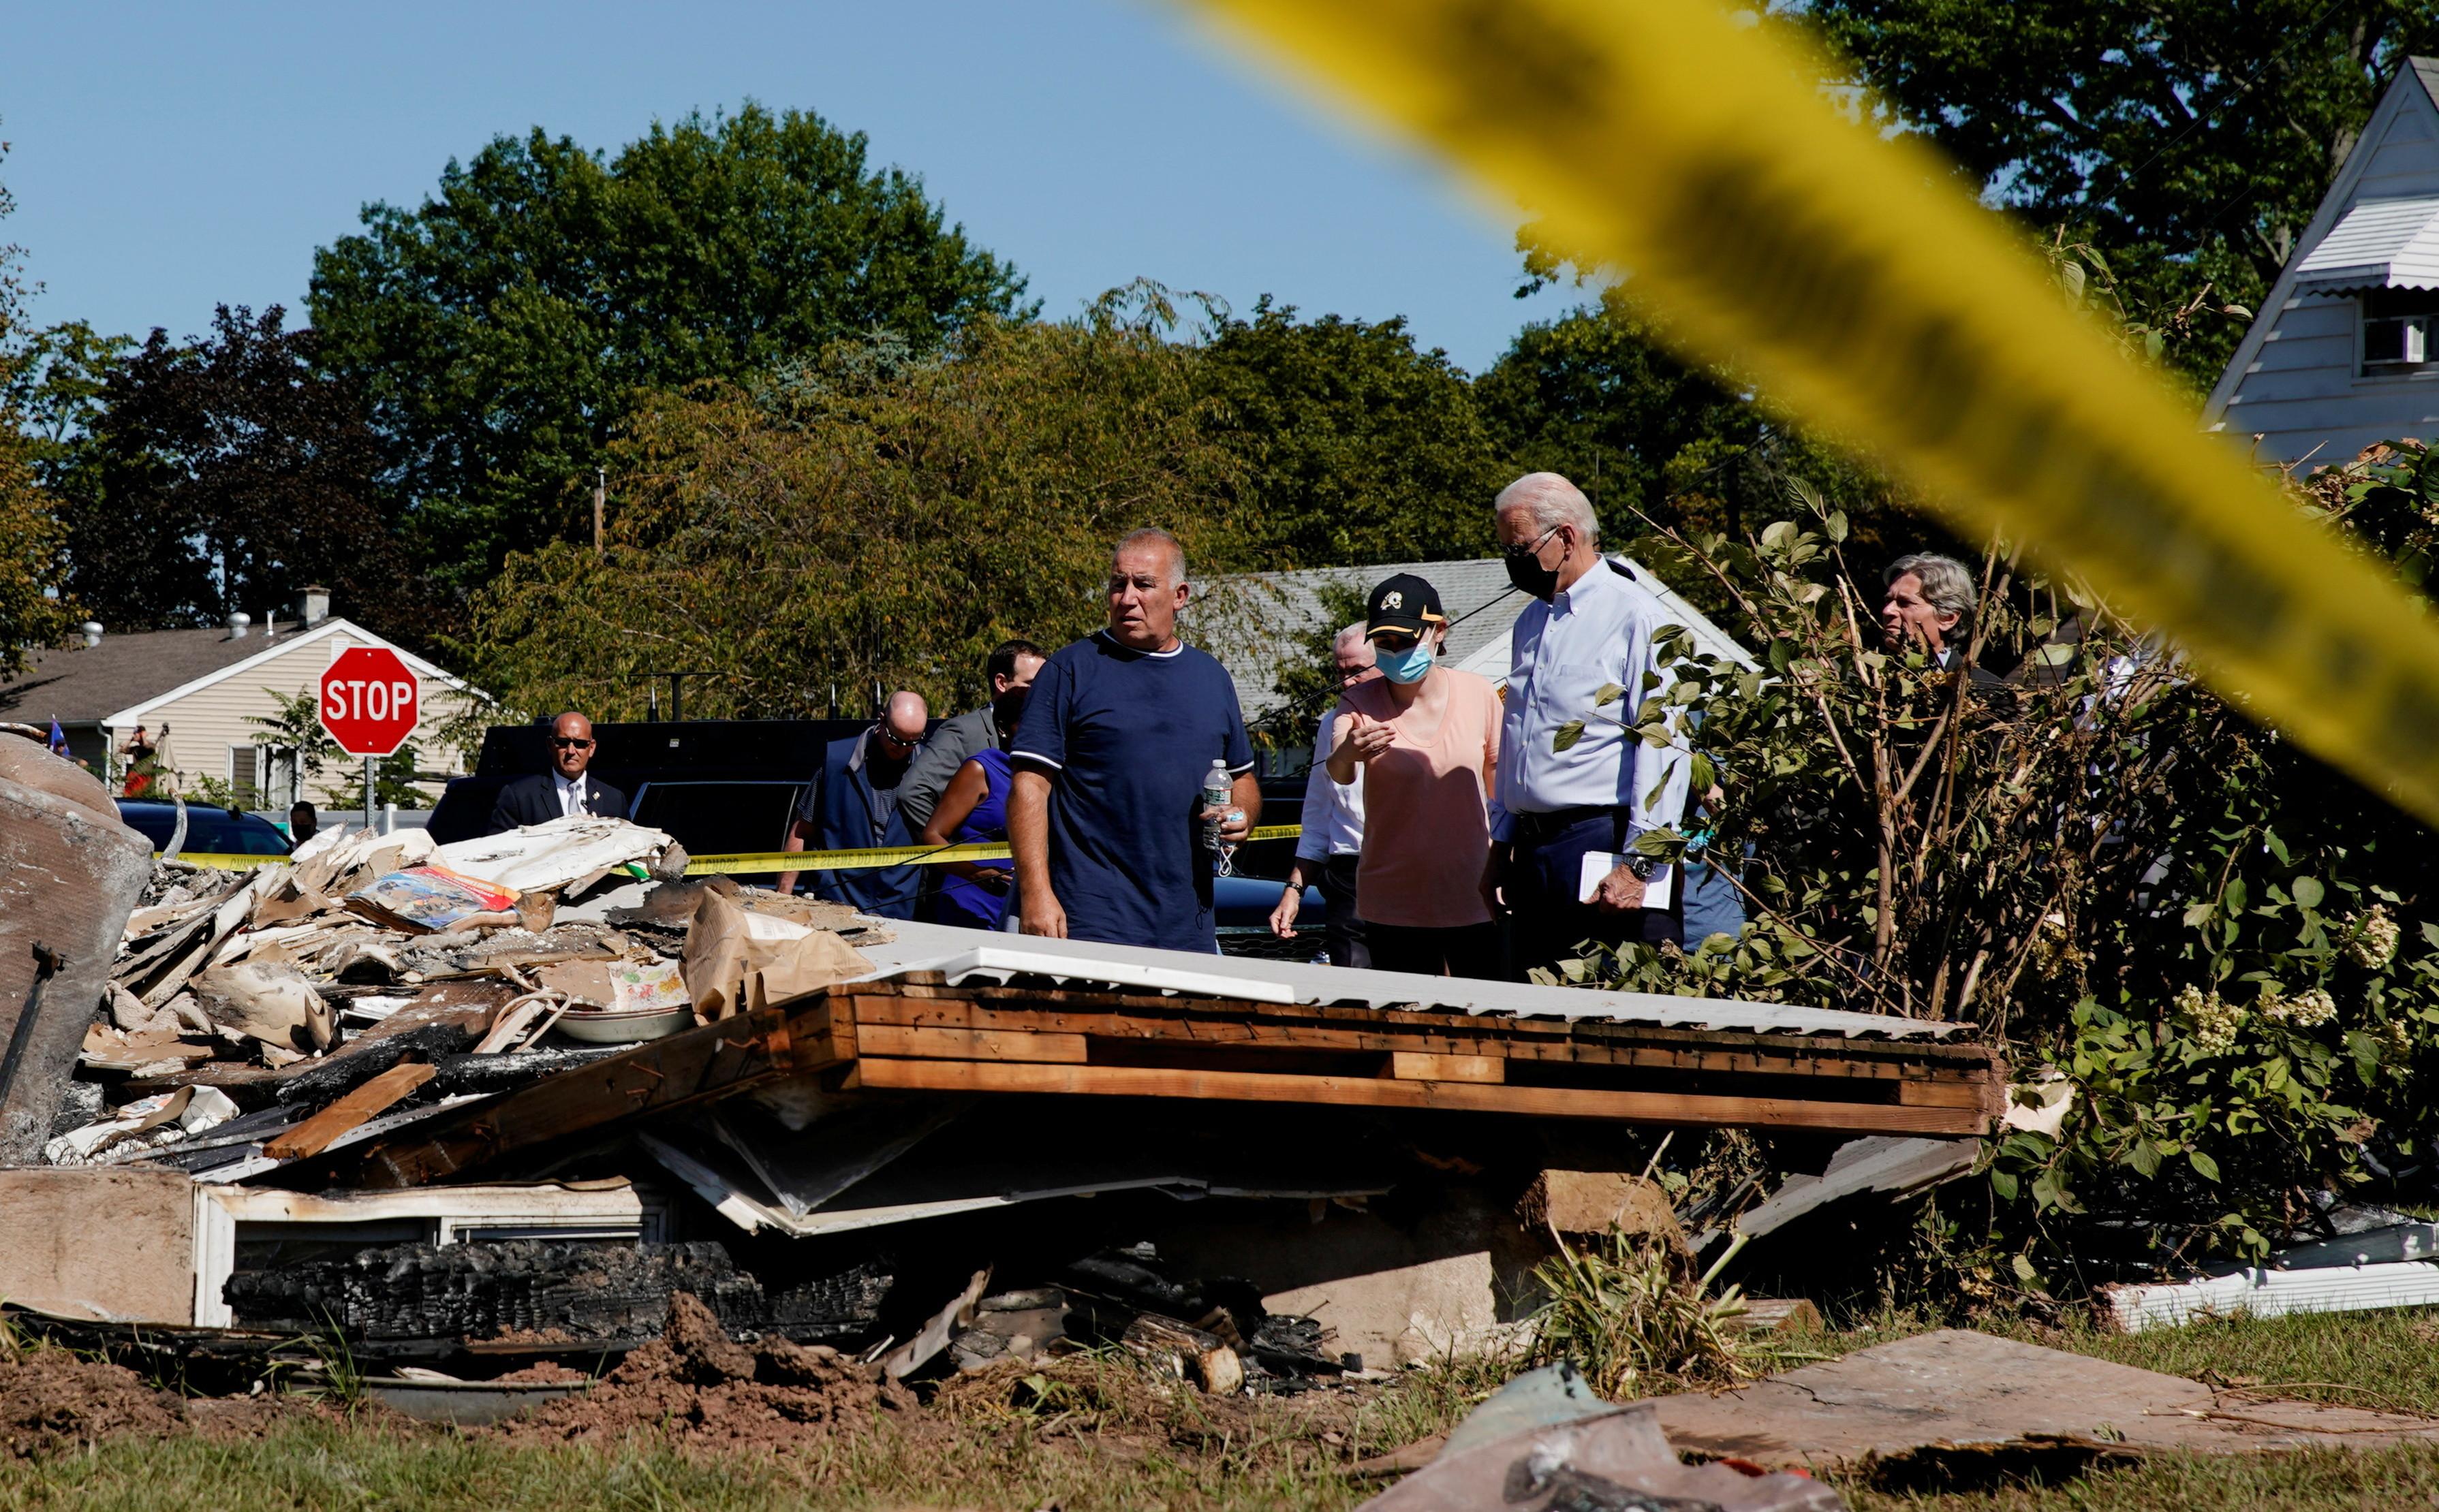 U.S. President Joe Biden tours the Lost Valley neighborhood in Manville that was impacted by Hurricane Ida, New Jersey, U.S., September 7, 2021. REUTERS/Elizabeth Frantz - RC26LP90SEFZ